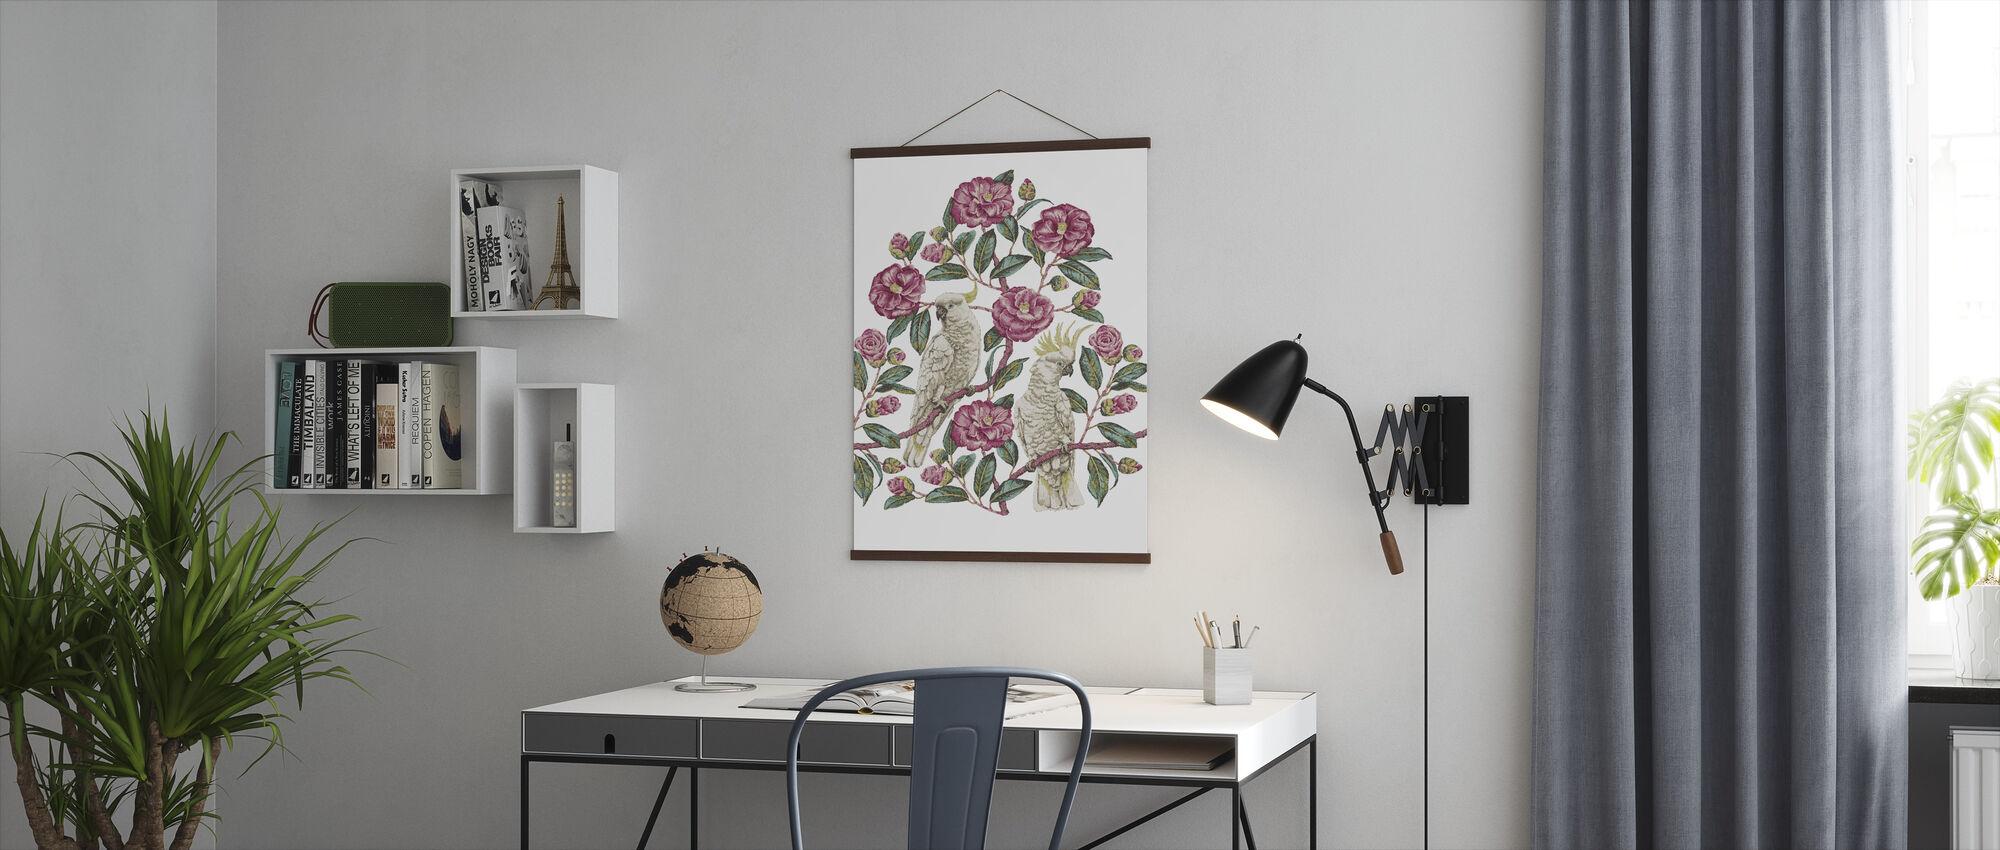 Cockatoo Paradise - Geranium and Emerald - Poster - Office